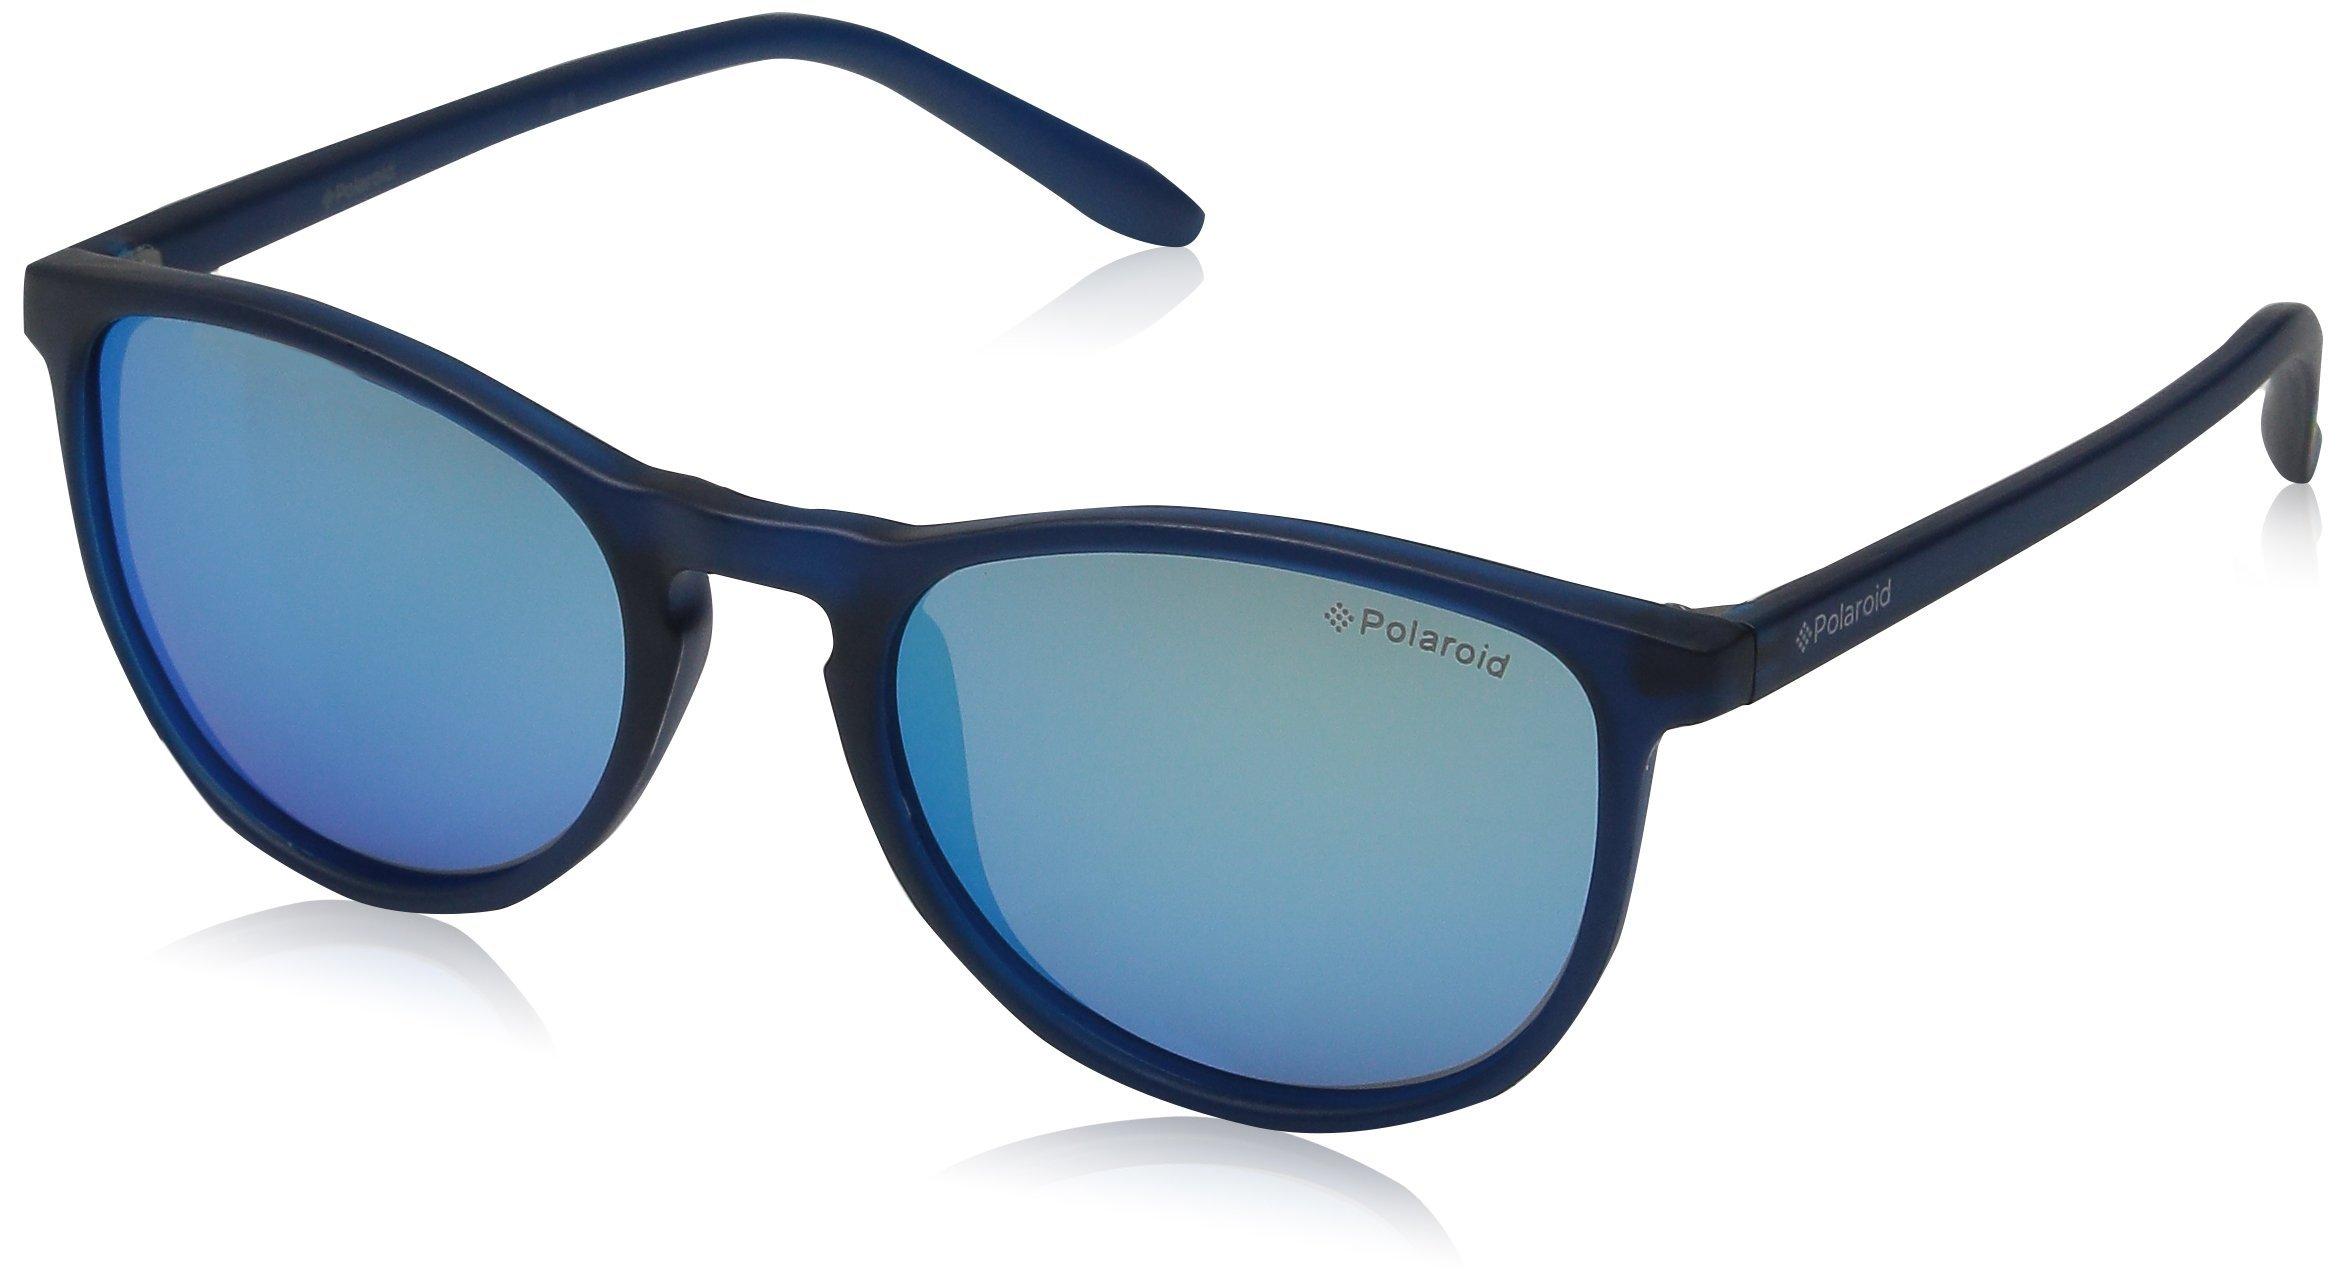 Polaroid Sunglasses PLD8016N Polarized Oval Sunglasses, Blue Transparent/Gray Blue Mirror Polarized, 48 mm